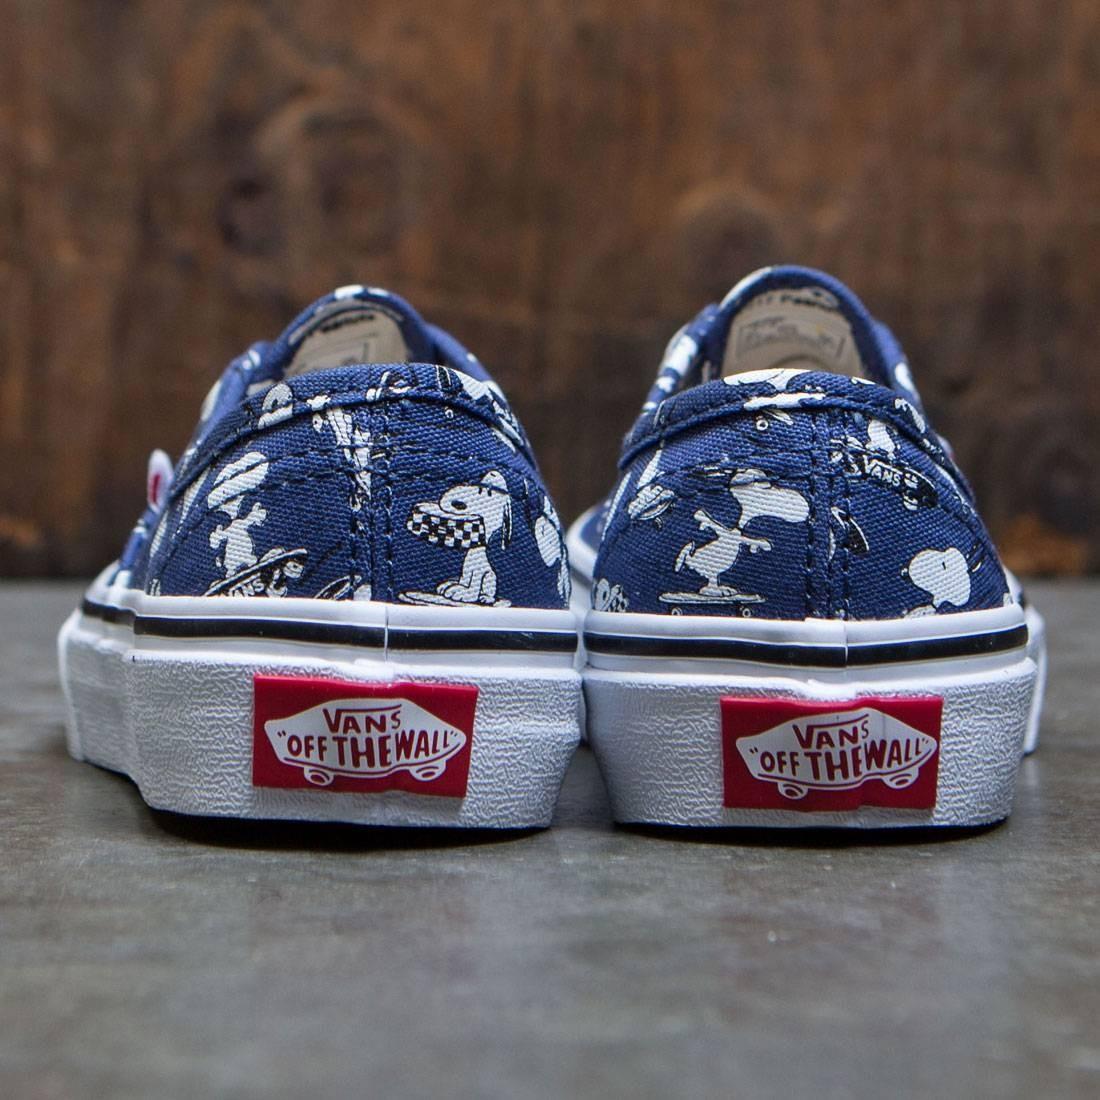 a0a689d8dffc34 Vans x Peanuts Big Kids Authentic - Snoopy Skating (blue)